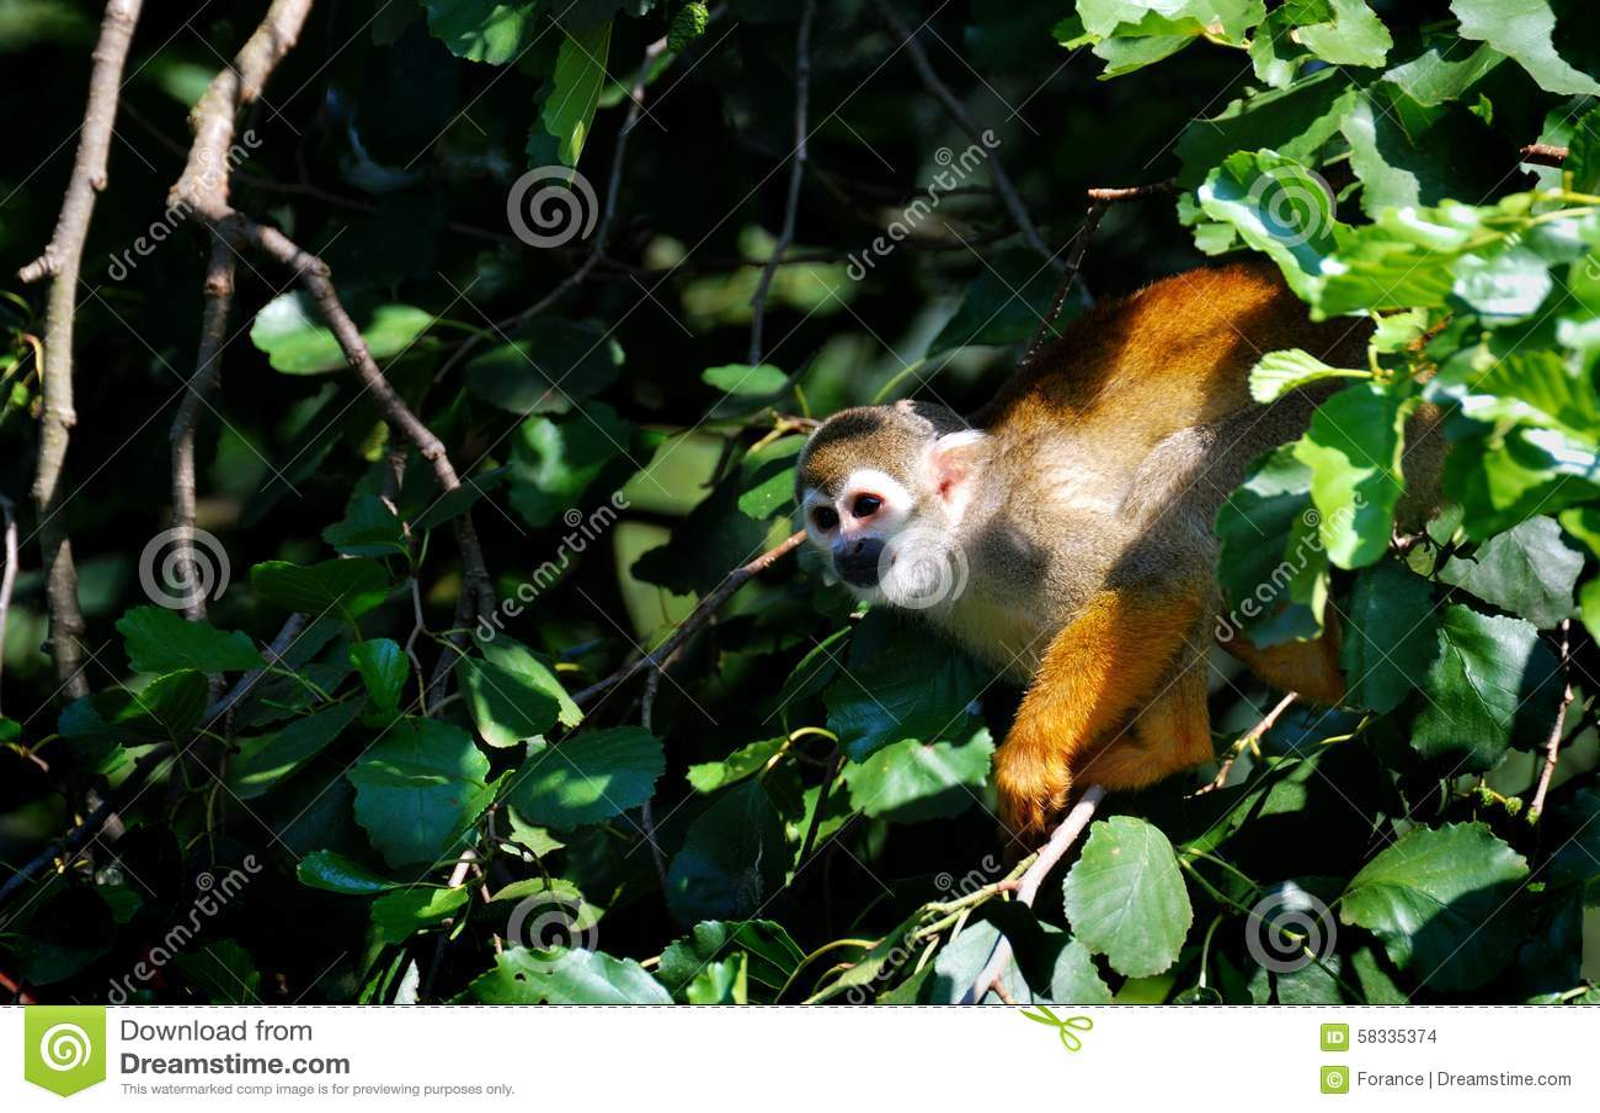 Squirrel monkeys in trees - photo#17